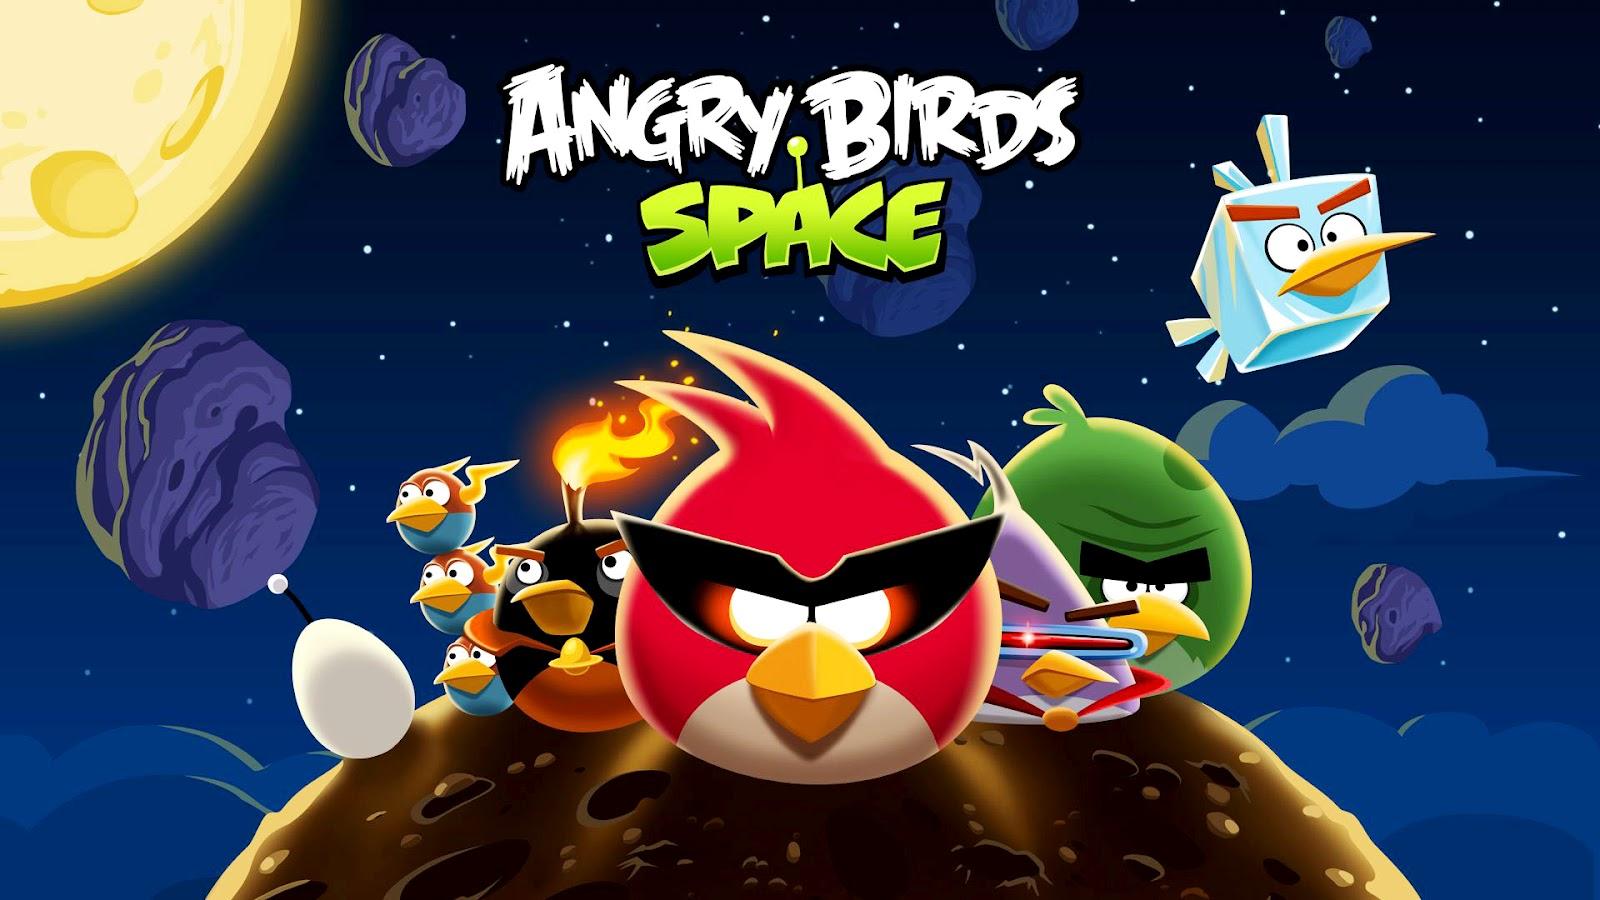 http://1.bp.blogspot.com/-asyLdOcijiI/T2tQIh31cAI/AAAAAAAAA8k/8PjPUPdFlJM/s1600/Angry_Birds_Space_HD_Game_Wallpaper-gWb.jpg